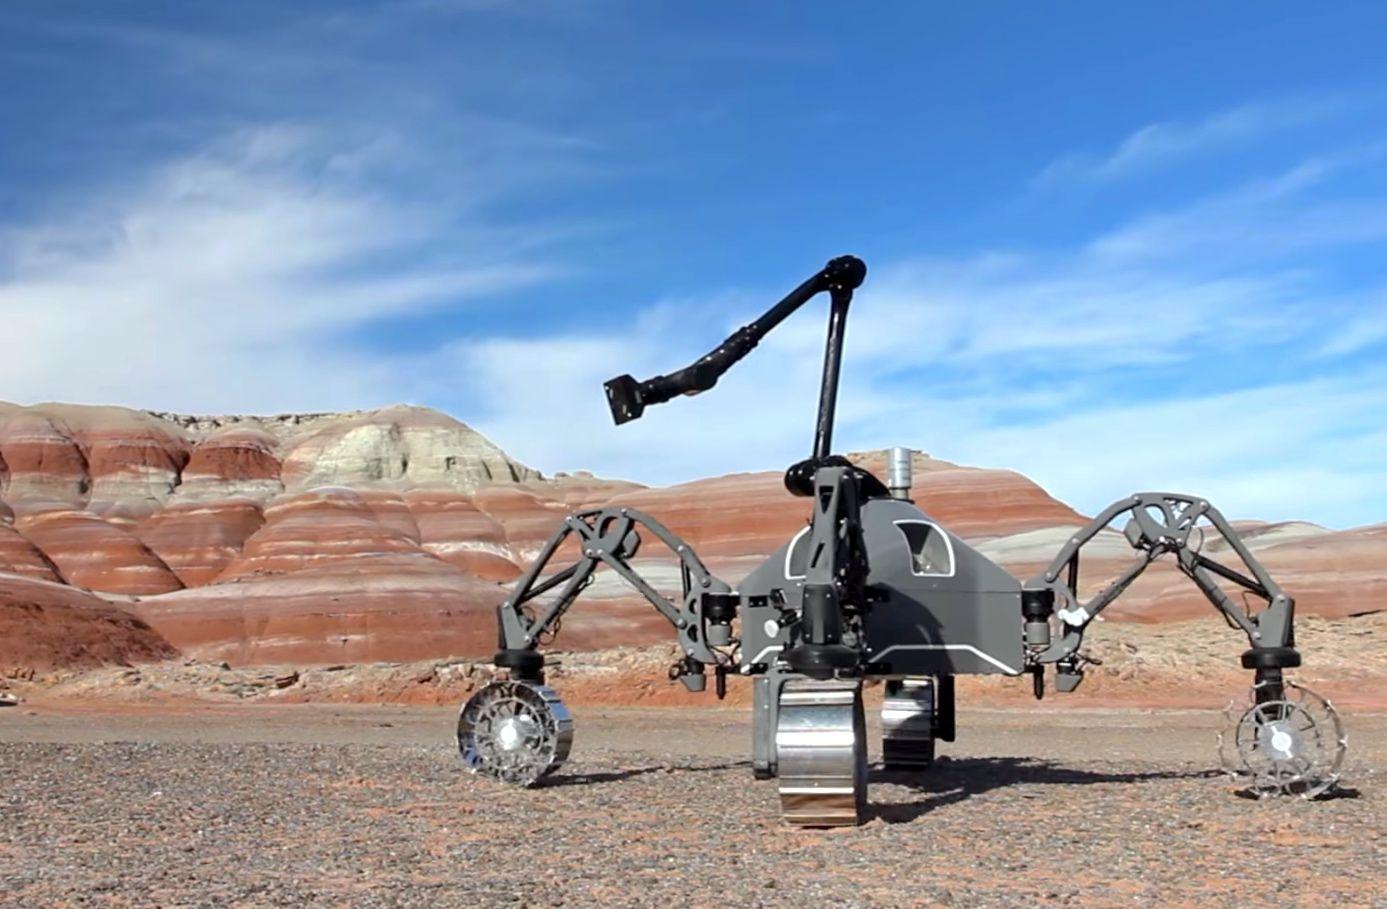 Pin on Robots